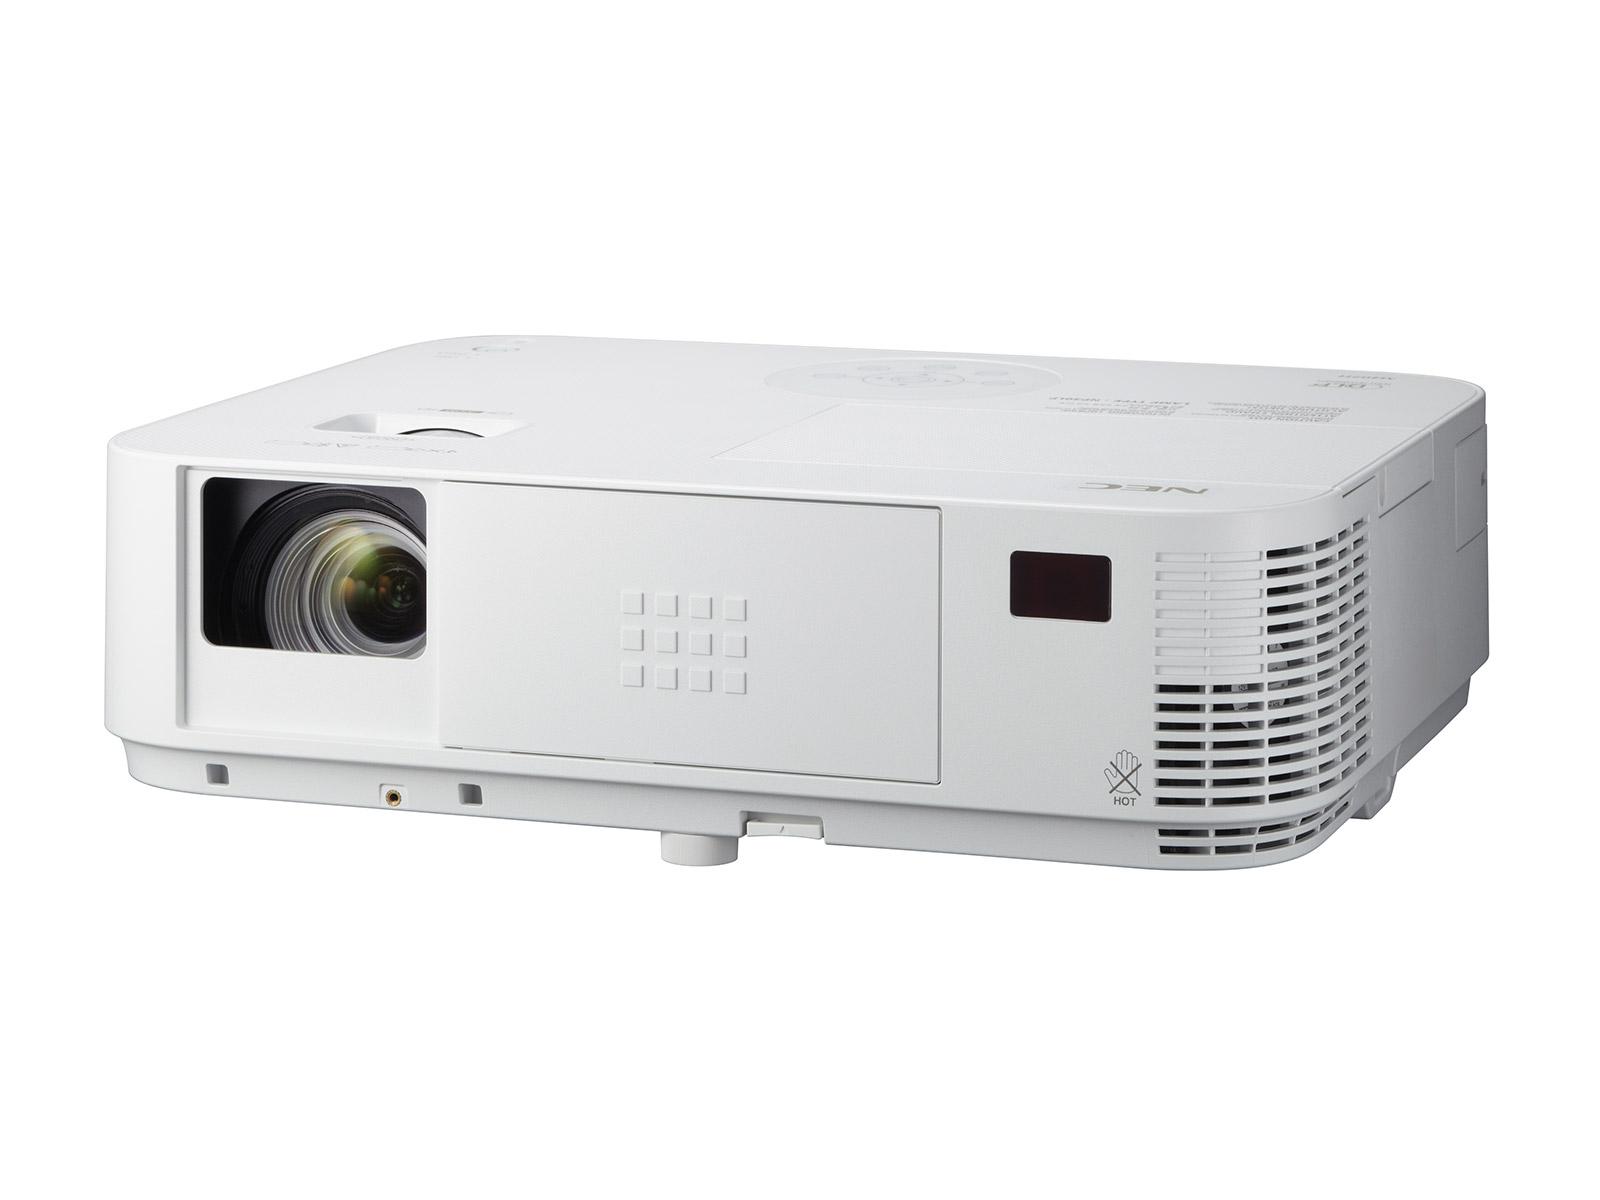 NEC - Projecteur DLP - 3D - 4000 ANSI Lumens - Full HD (1920x1080) - 16:9 - HD 1080p LAN - 10000:1 - 3.7 kg